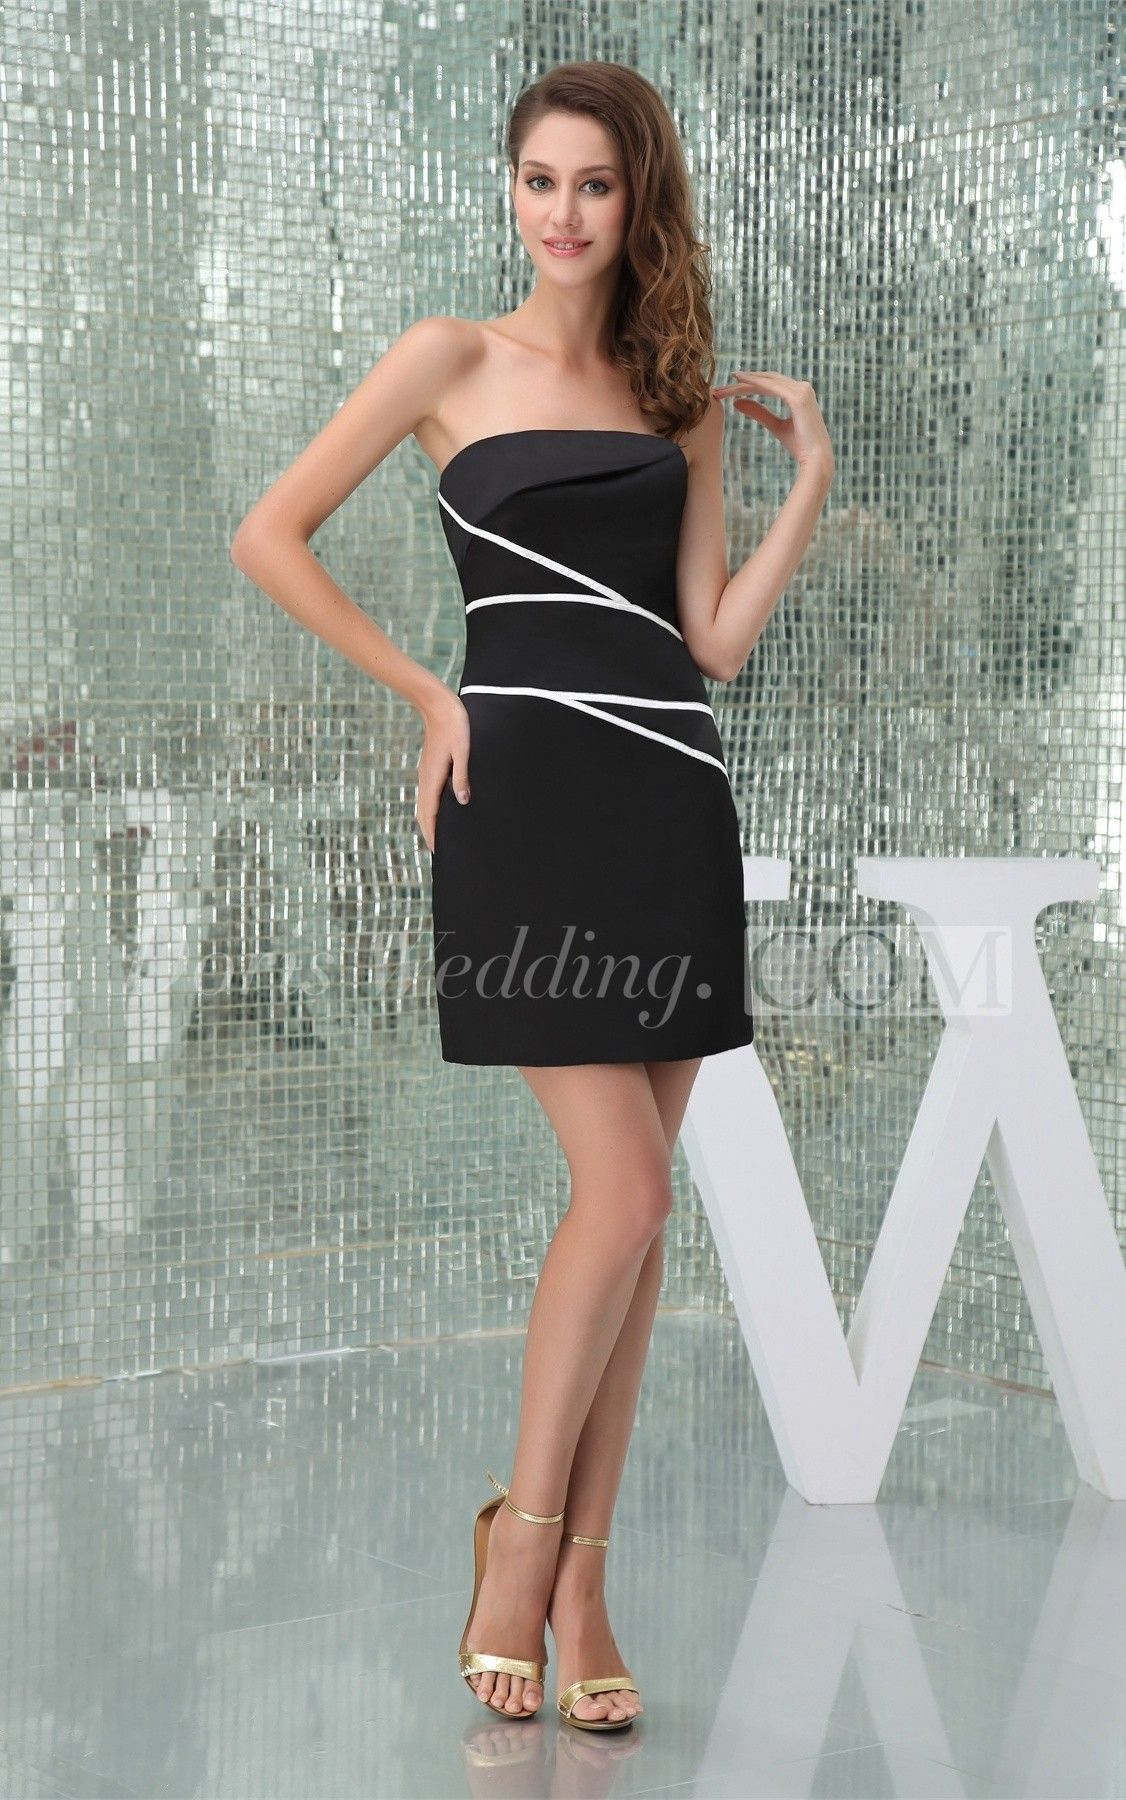 Black dress under white graduation gown - Black Dress Under White Graduation Gown 29